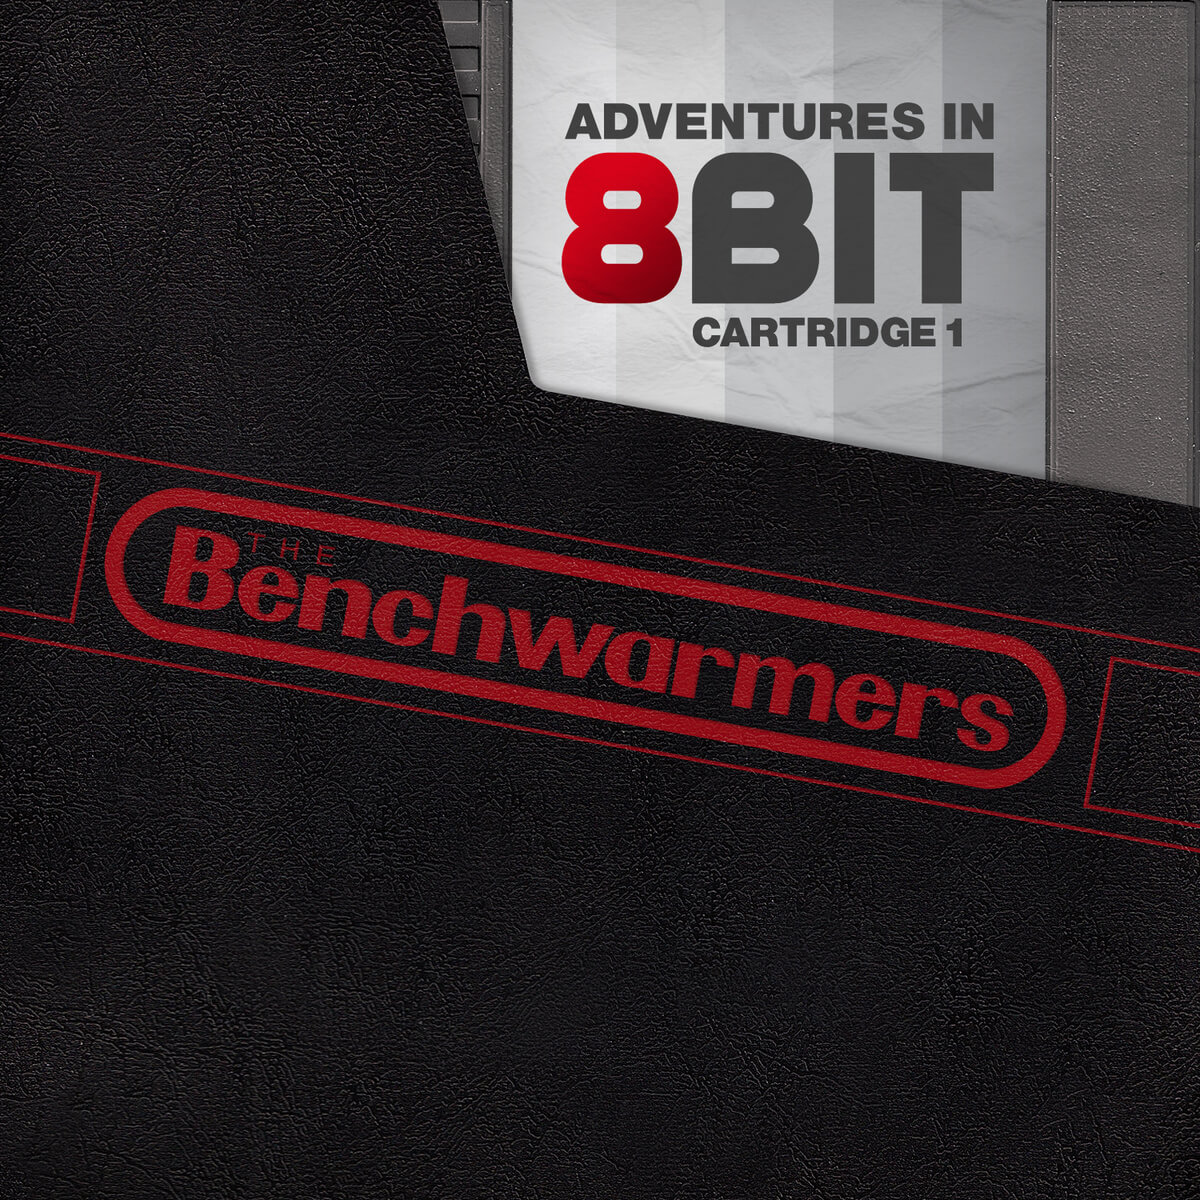 The BenchWarmers Clique - Adventures in 8bit: Cartridge 1